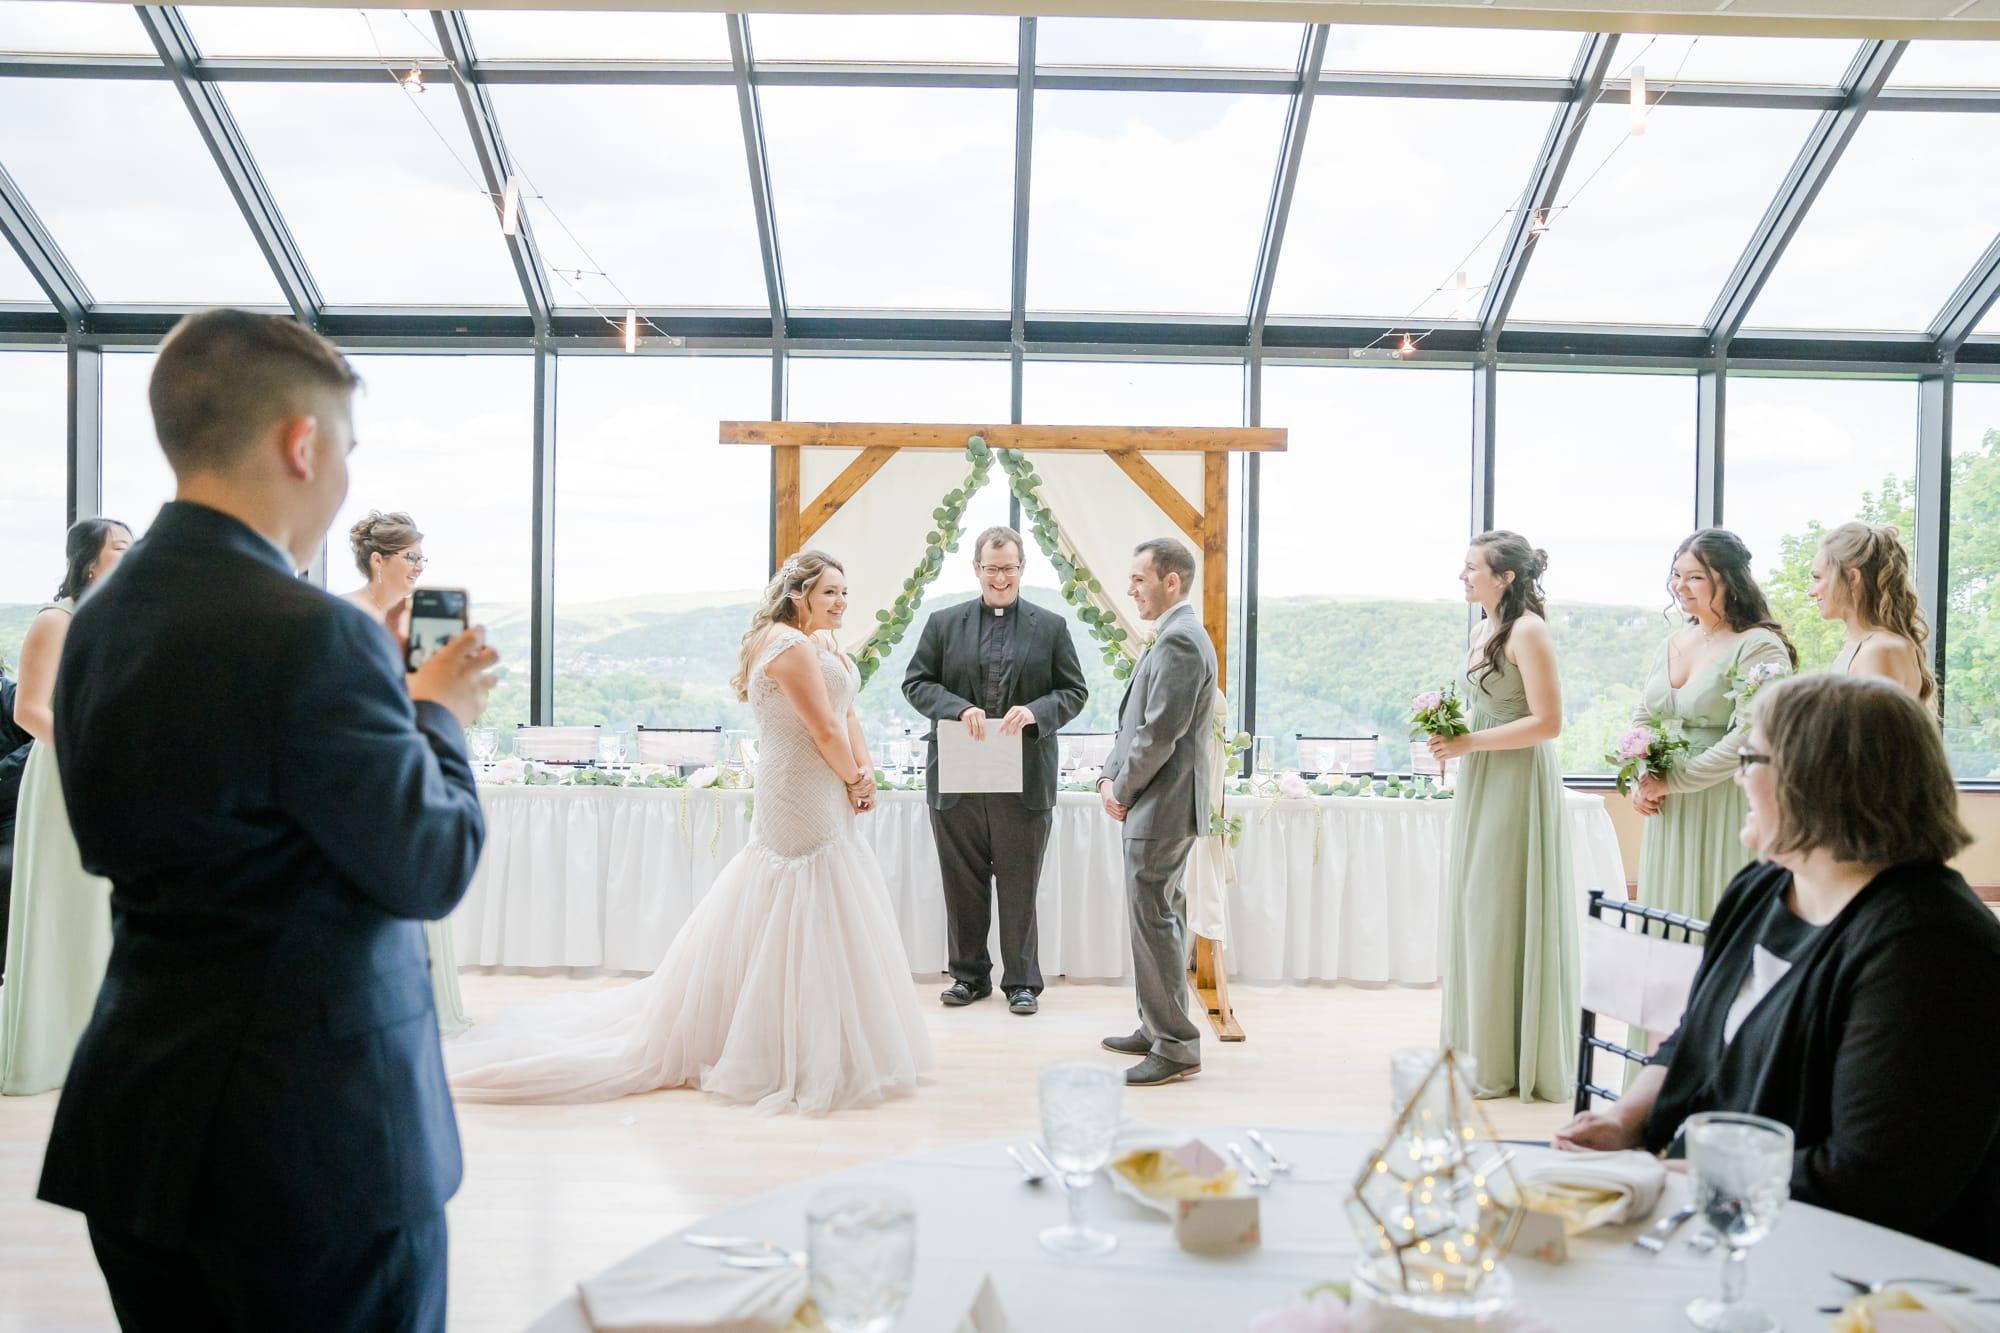 Central Pennsylvania PA summer wedding ceremony